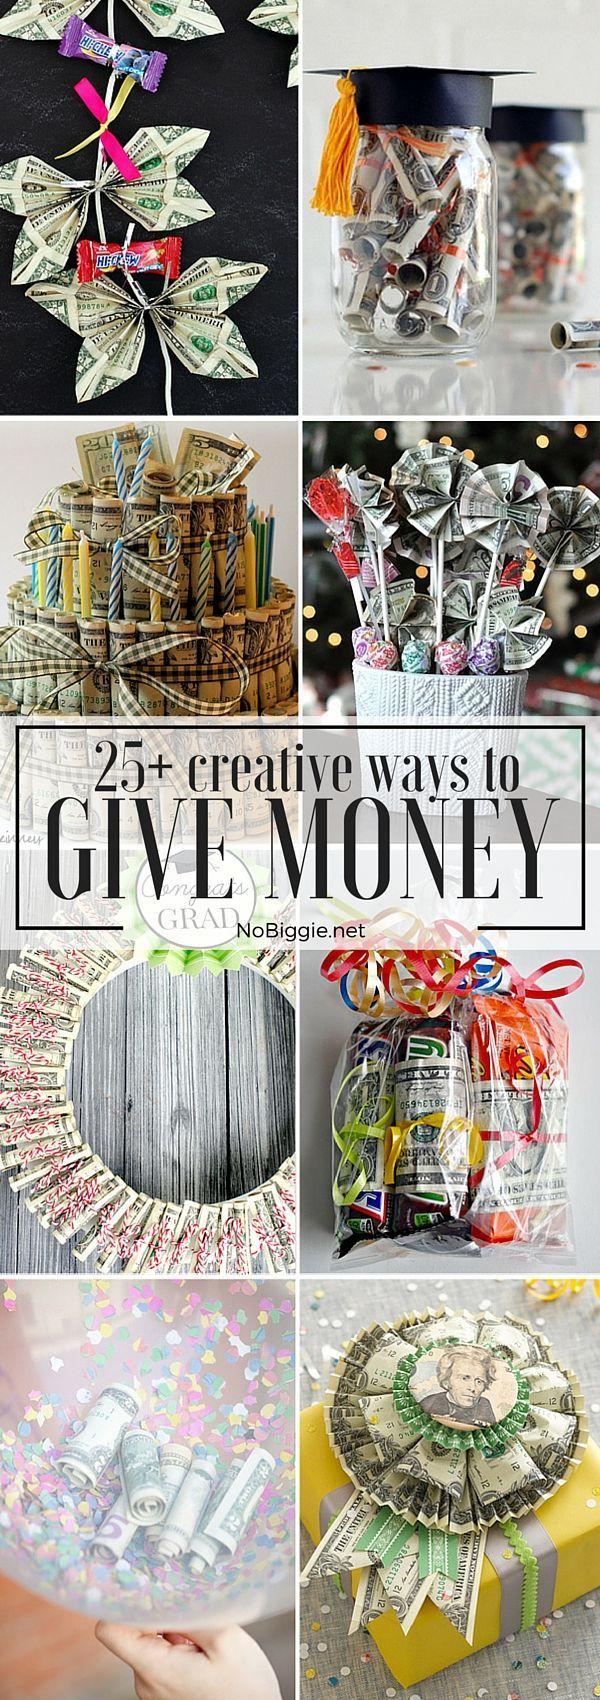 25+ Creative Ways to Give Money   NoBiggie.net